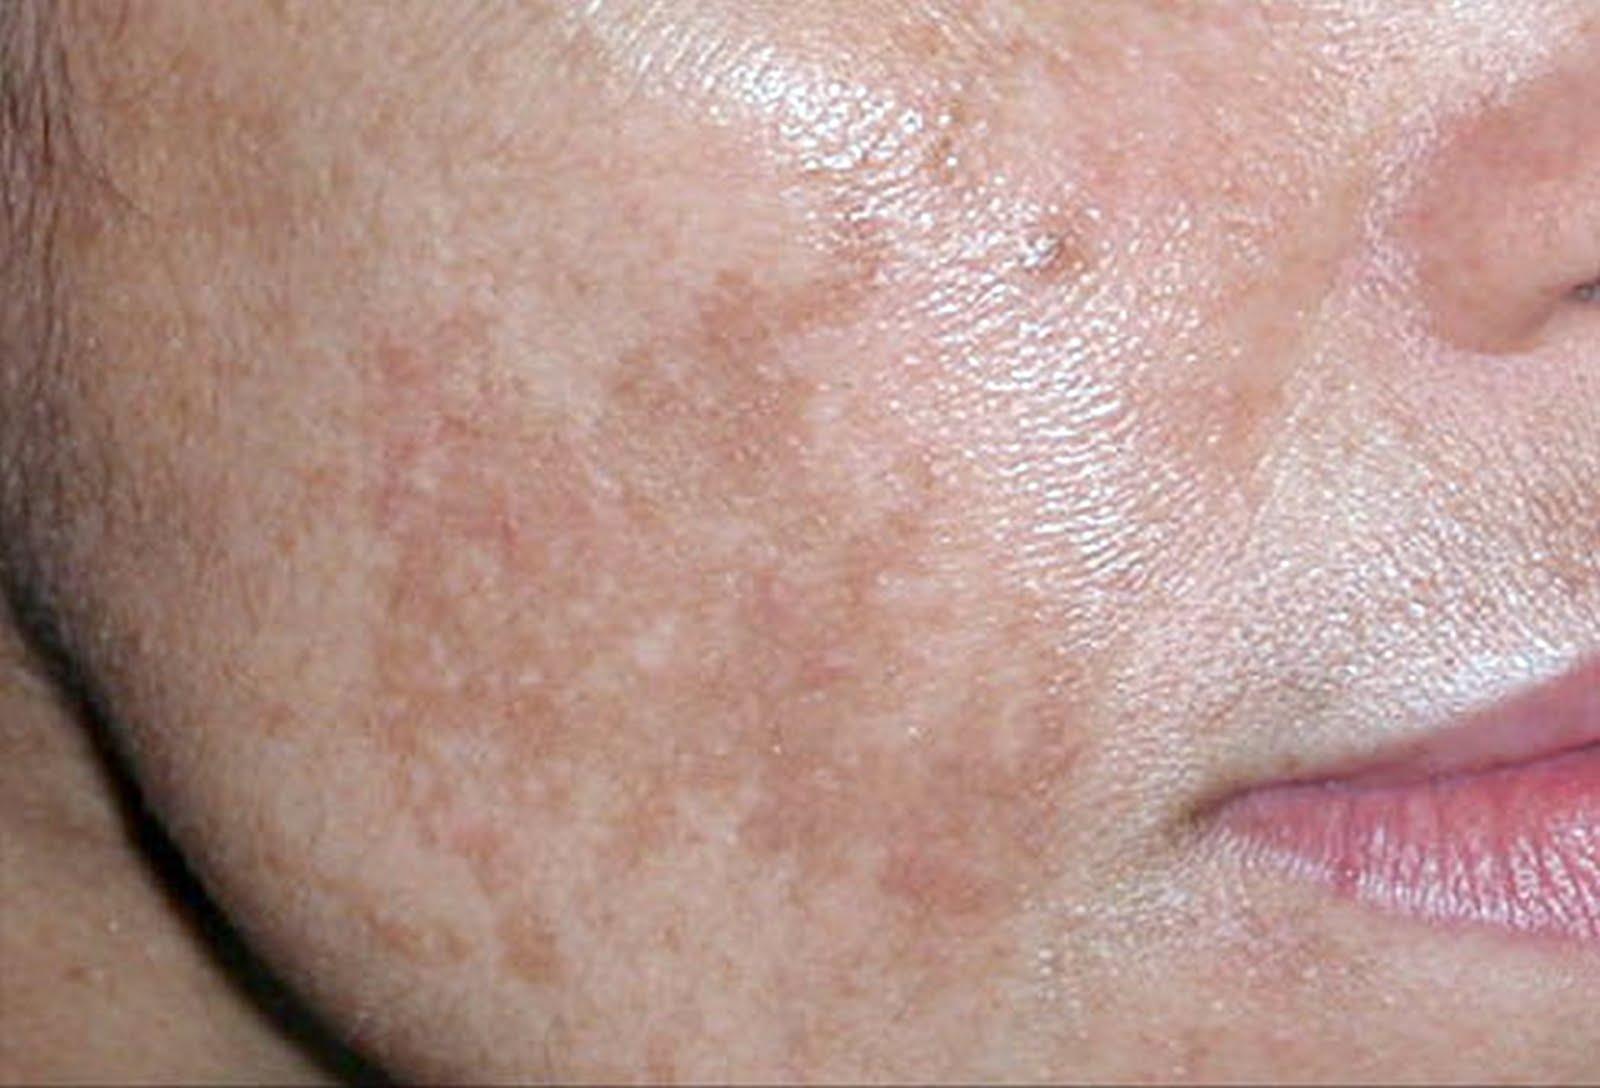 usa proteccion solar tu piel te lo agradecera